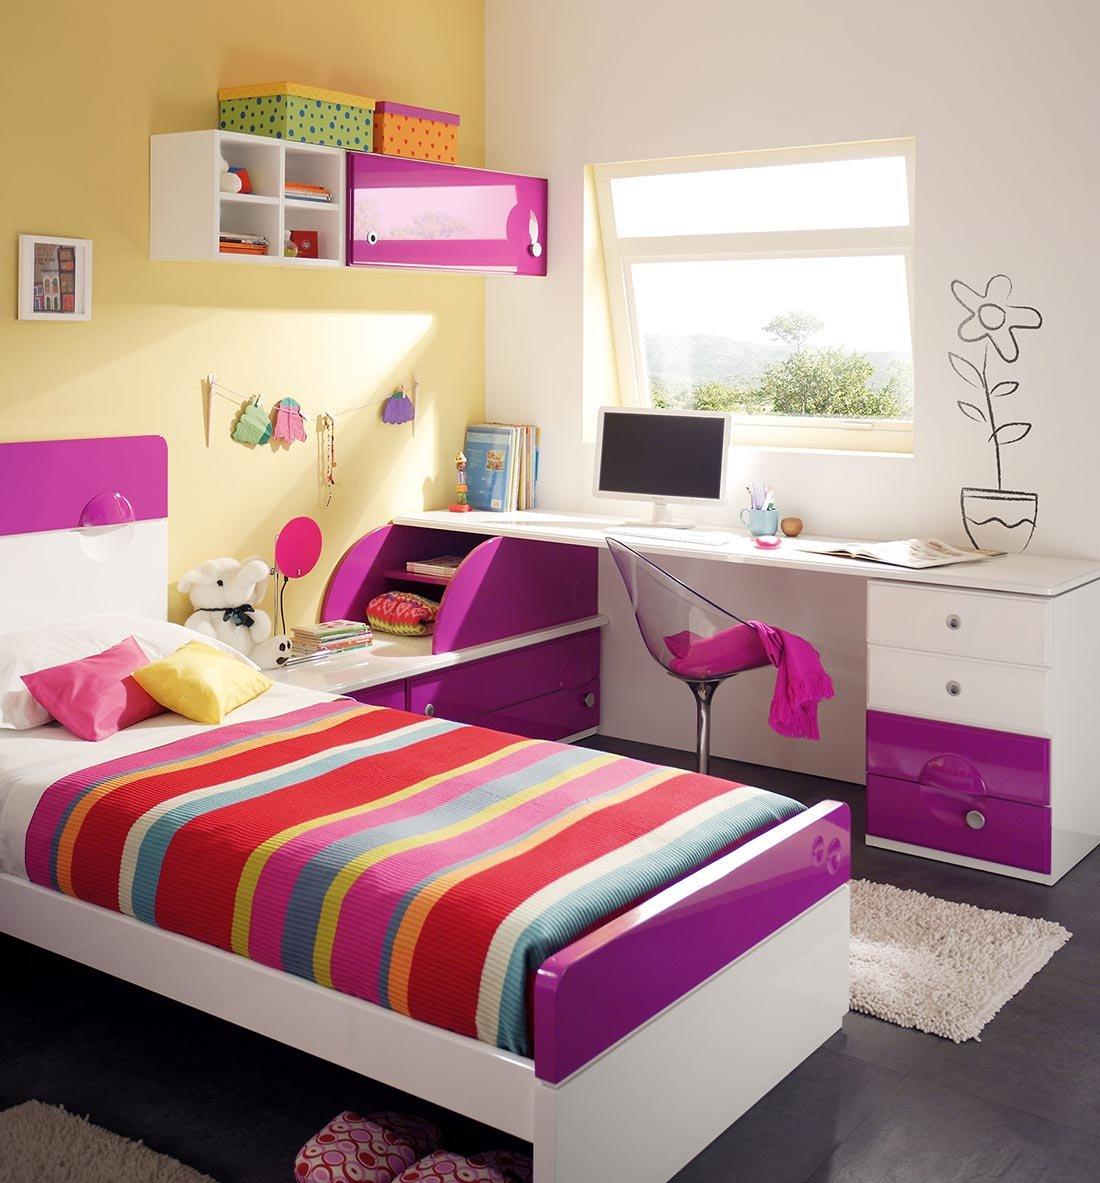 Habitaciones juveniles de la firma juraco decoraci n del hogar - Habitaciones juveniles muebles tuco ...